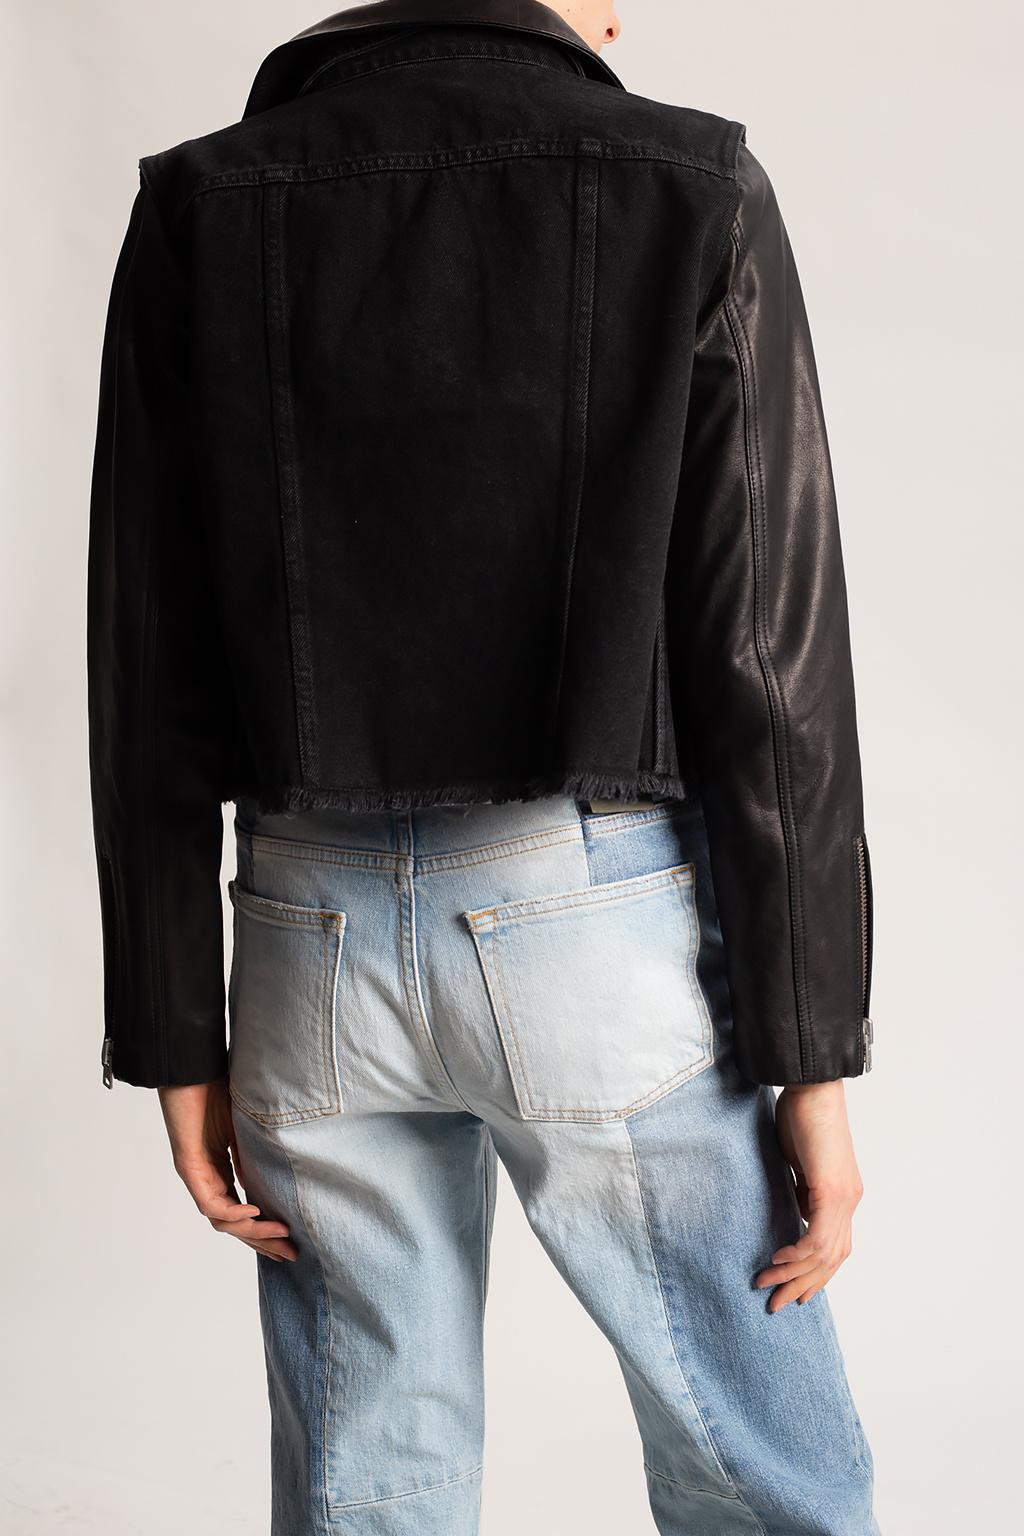 AllSaints 'Zayn' denim jacket